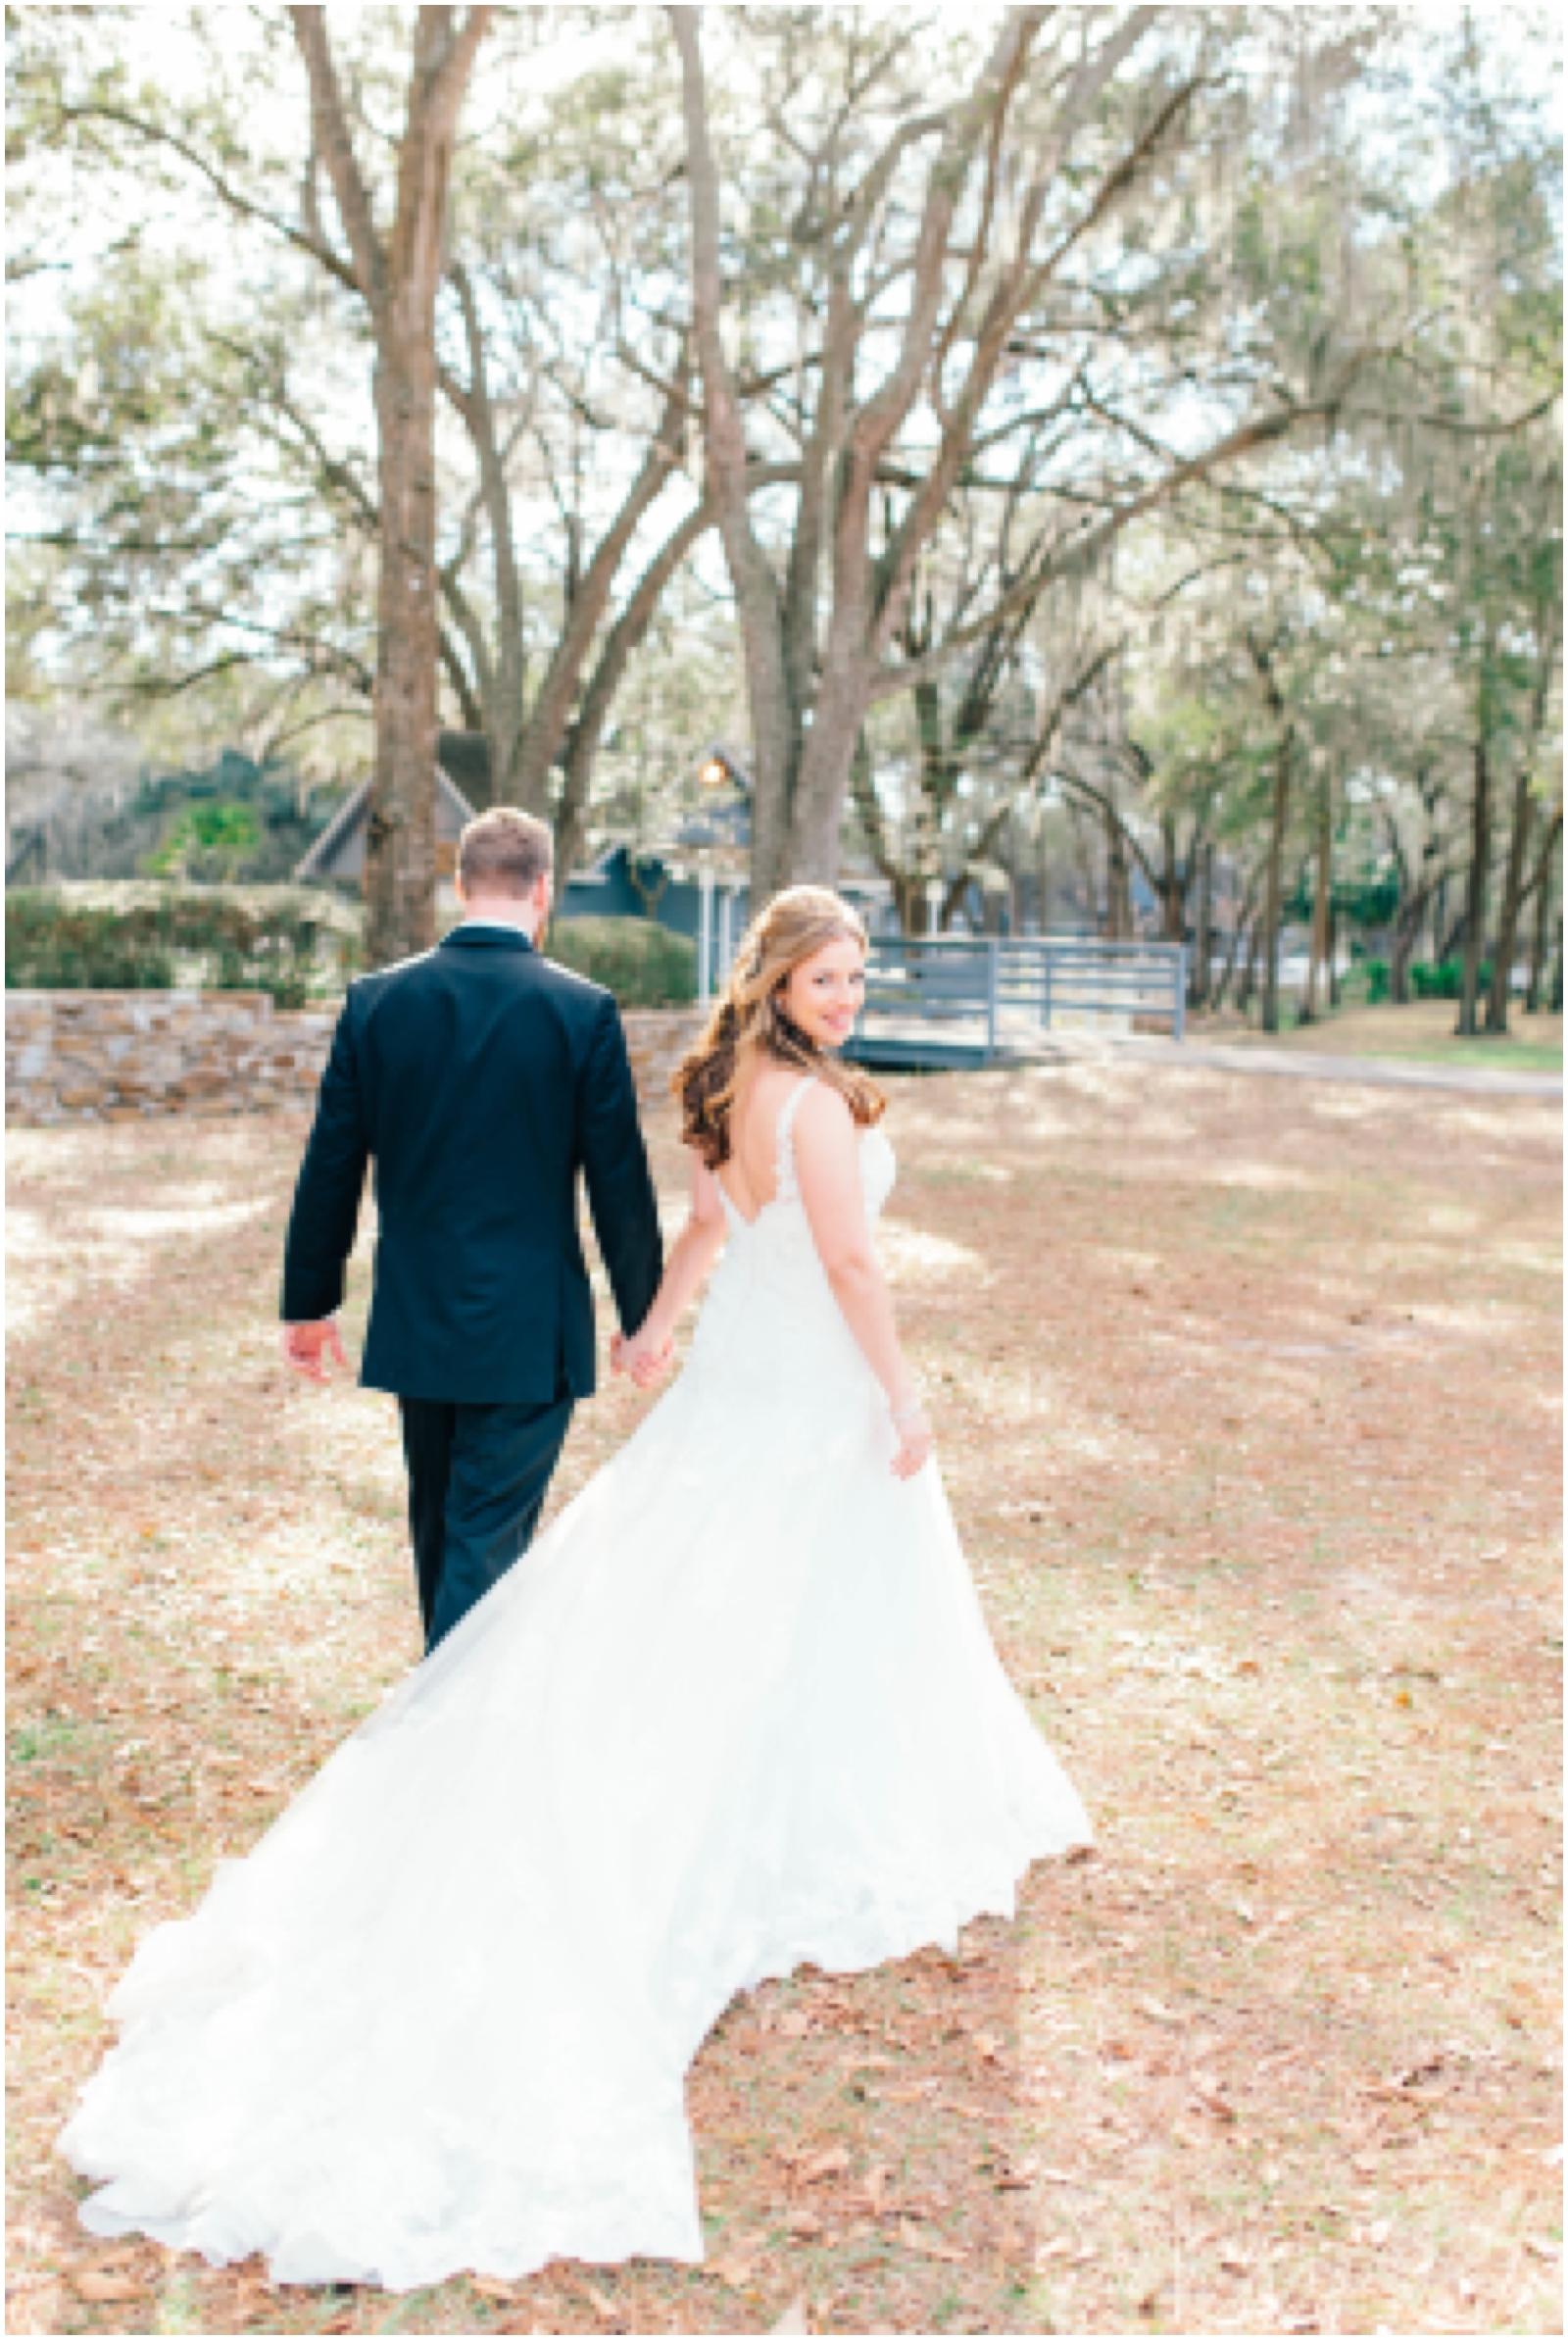 Tampa Area Wedding Venue with Southern Charm- Stonebridge Events_0272.jpg